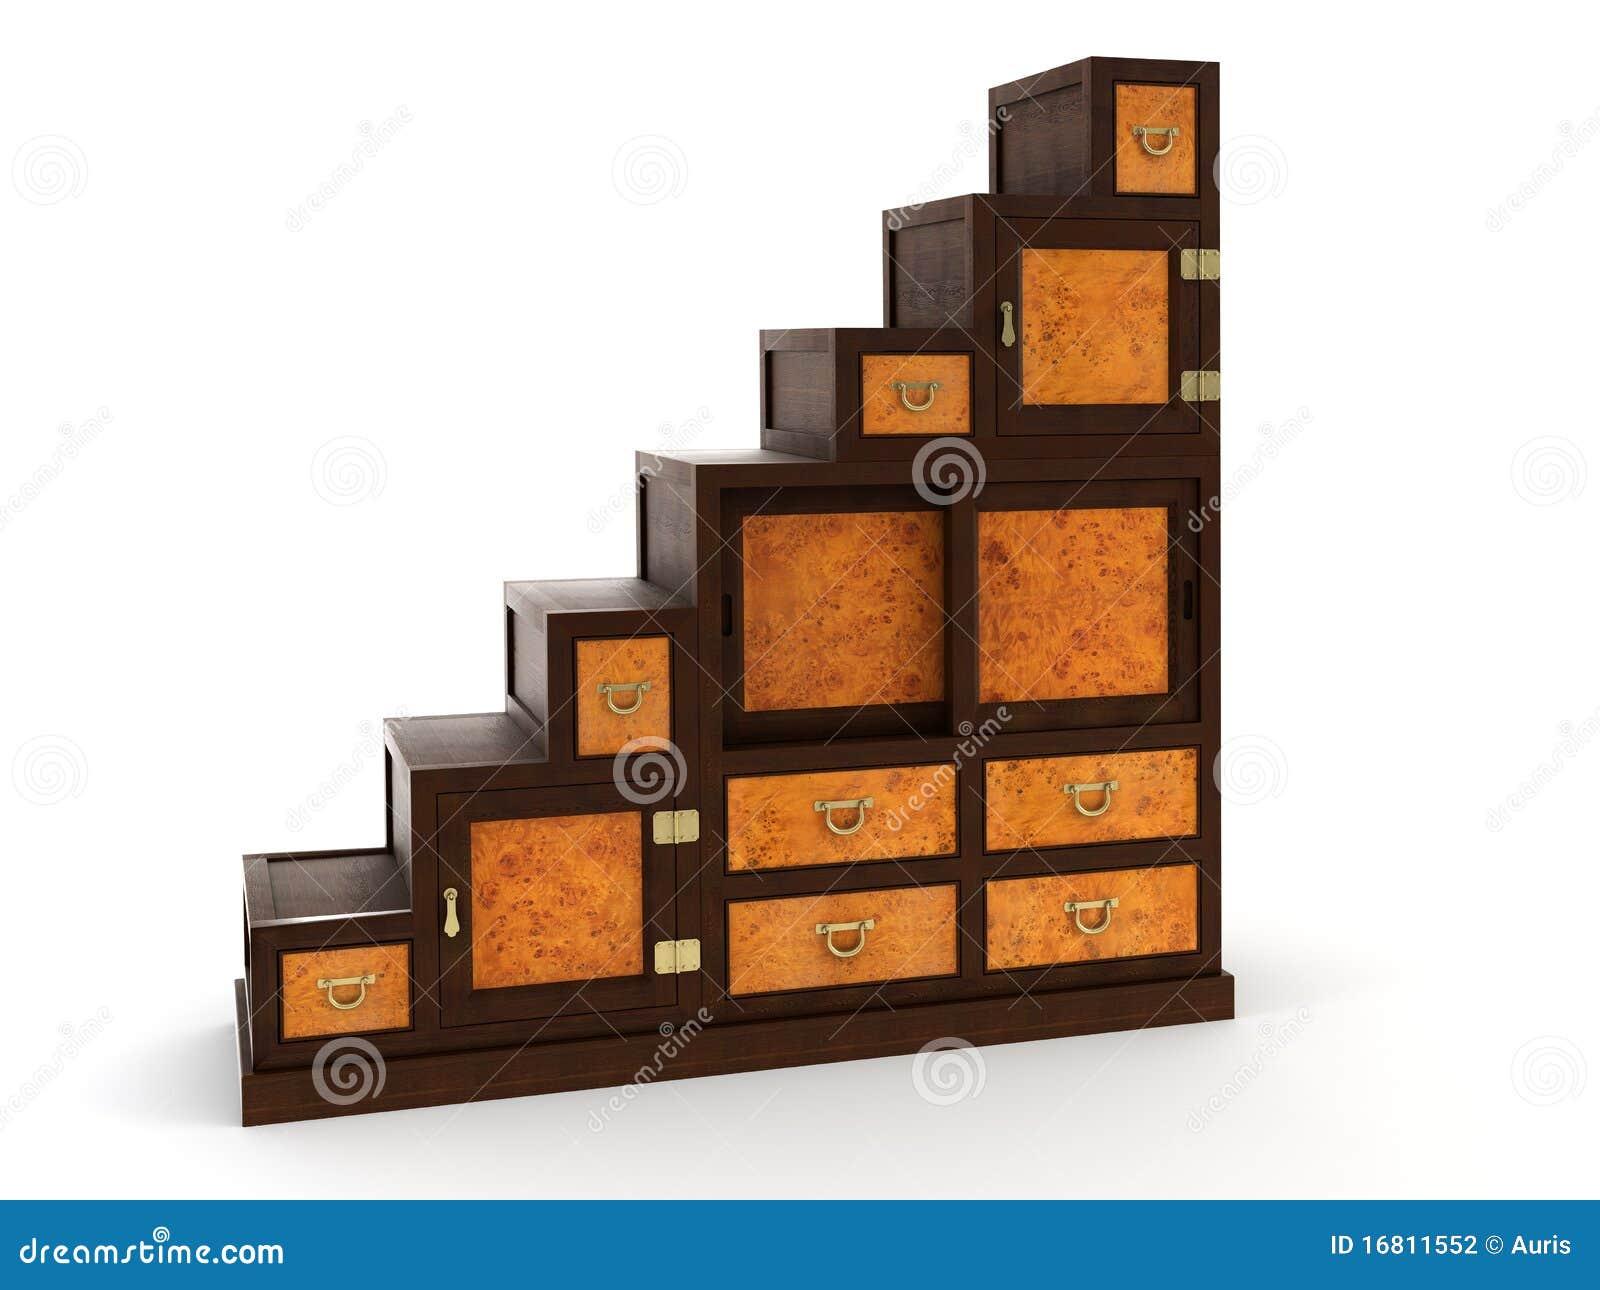 bureau 3d rendering stock photography image 16811552. Black Bedroom Furniture Sets. Home Design Ideas